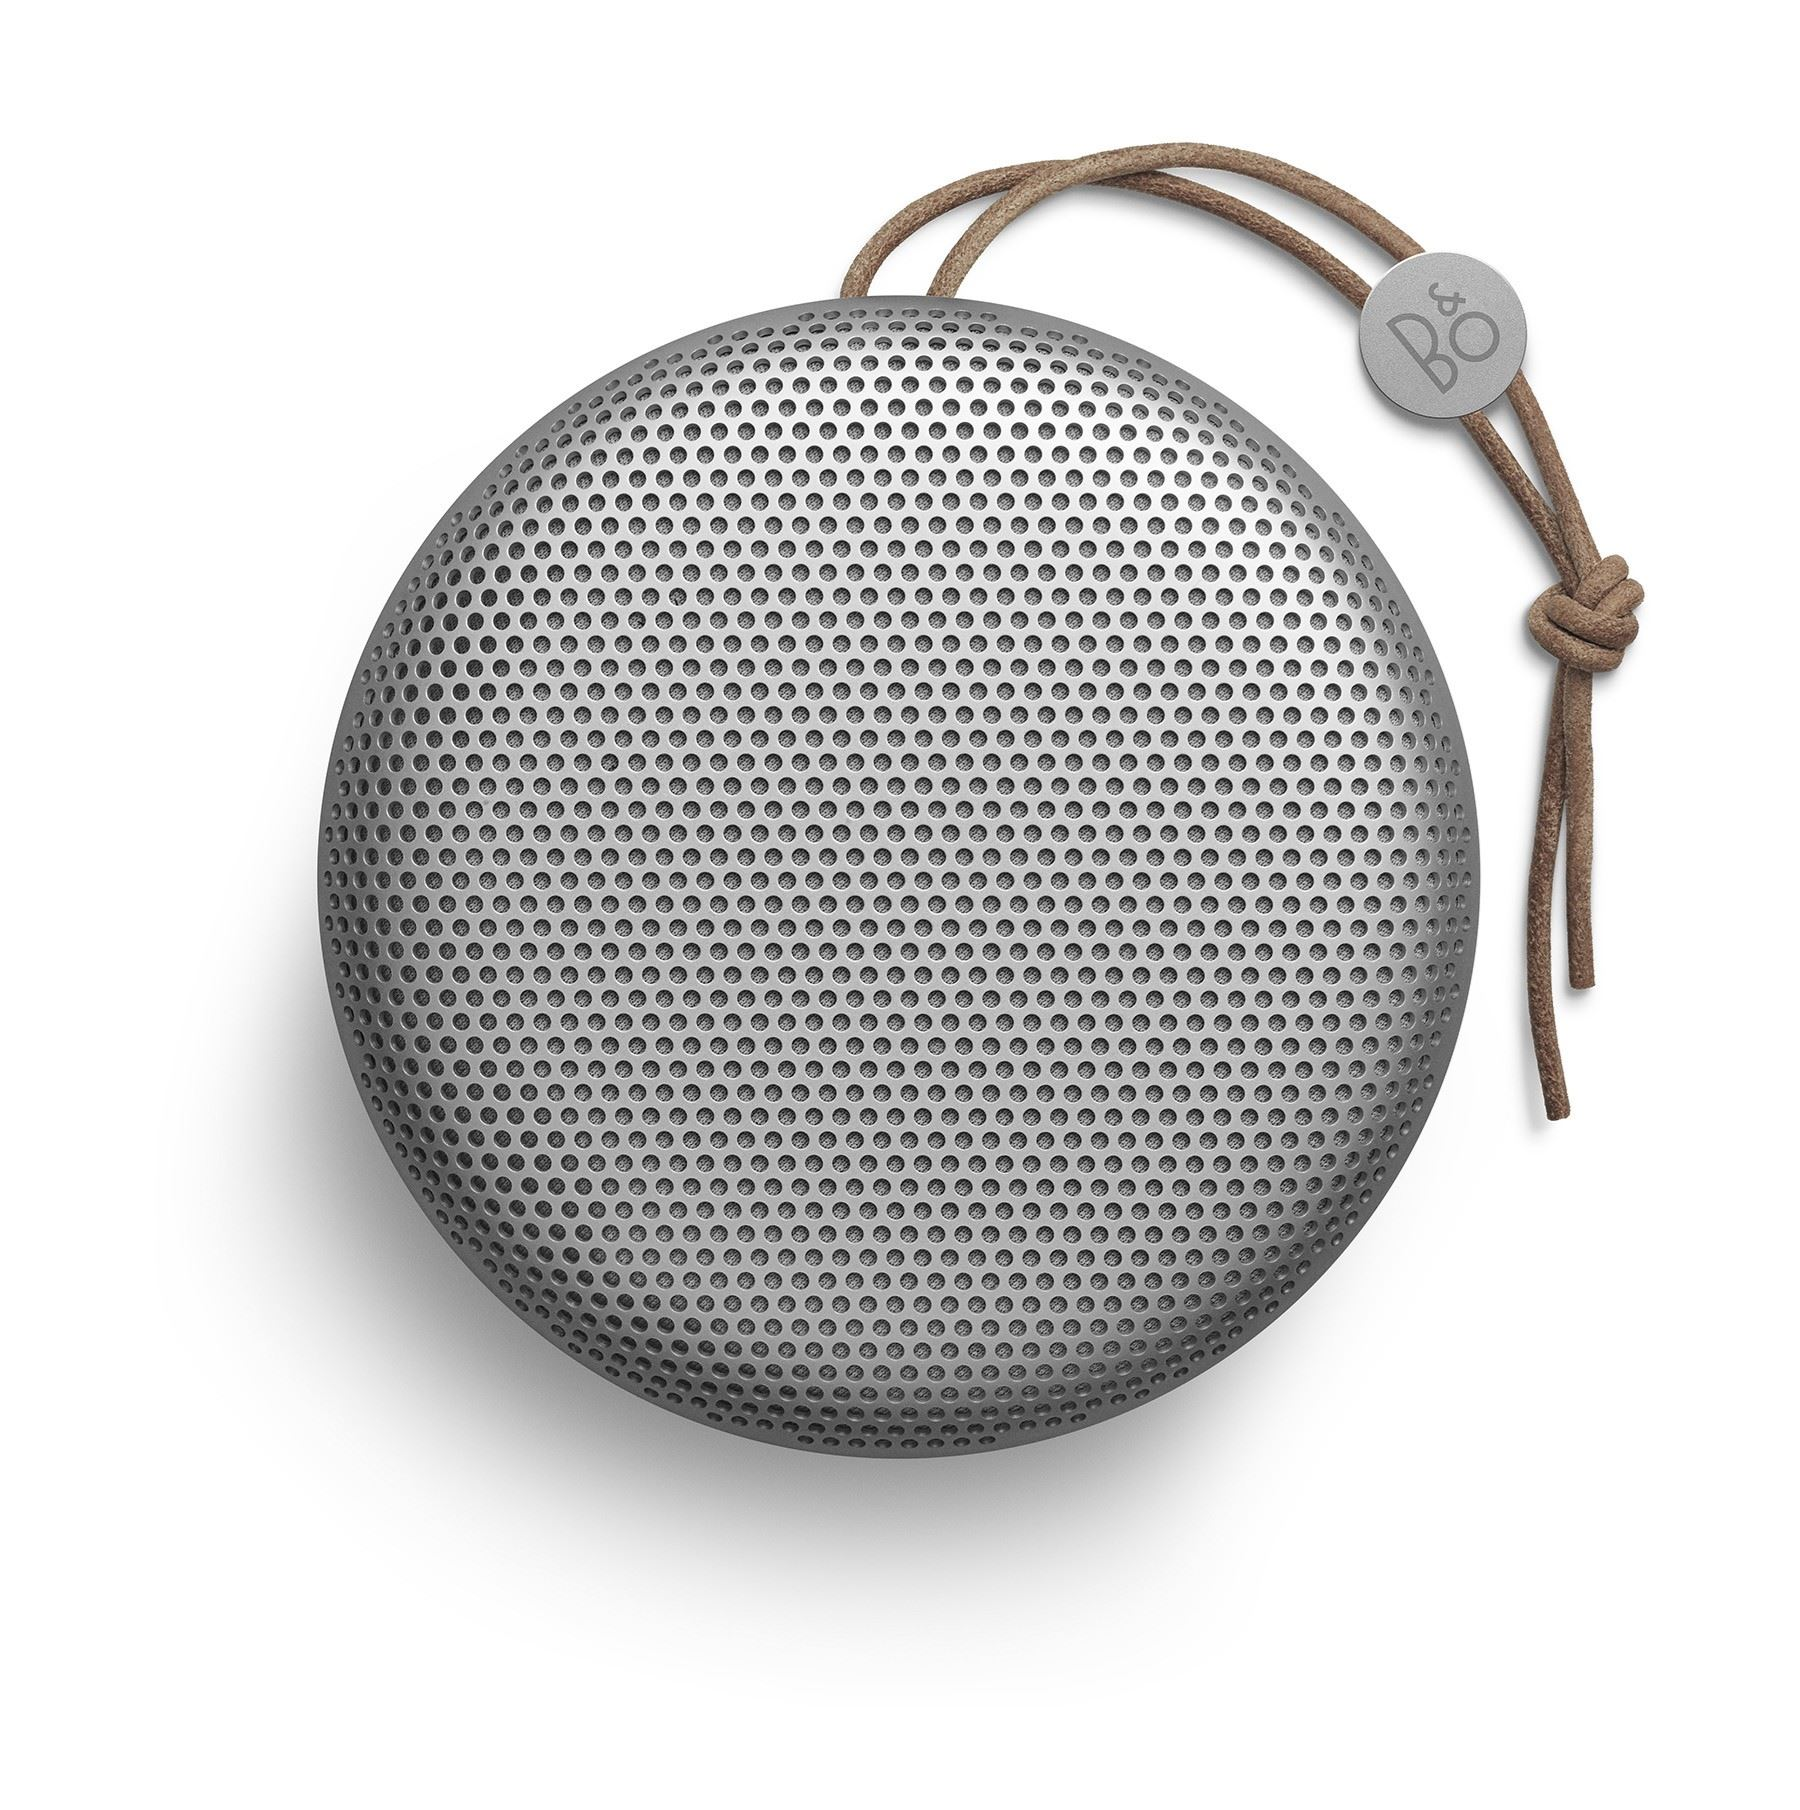 Joystick Bluetooth Seisa B O Beoplay P2 Portable Bluetooth Speaker Best Fm Bluetooth Transmitter For Older Cars Km19 Mag Mount Insignia Portable Bluetooth Speaker Ns Cspbt03: AudioW3. Bang & Olufsen Beoplay A1 Bluetooth Portable Speaker